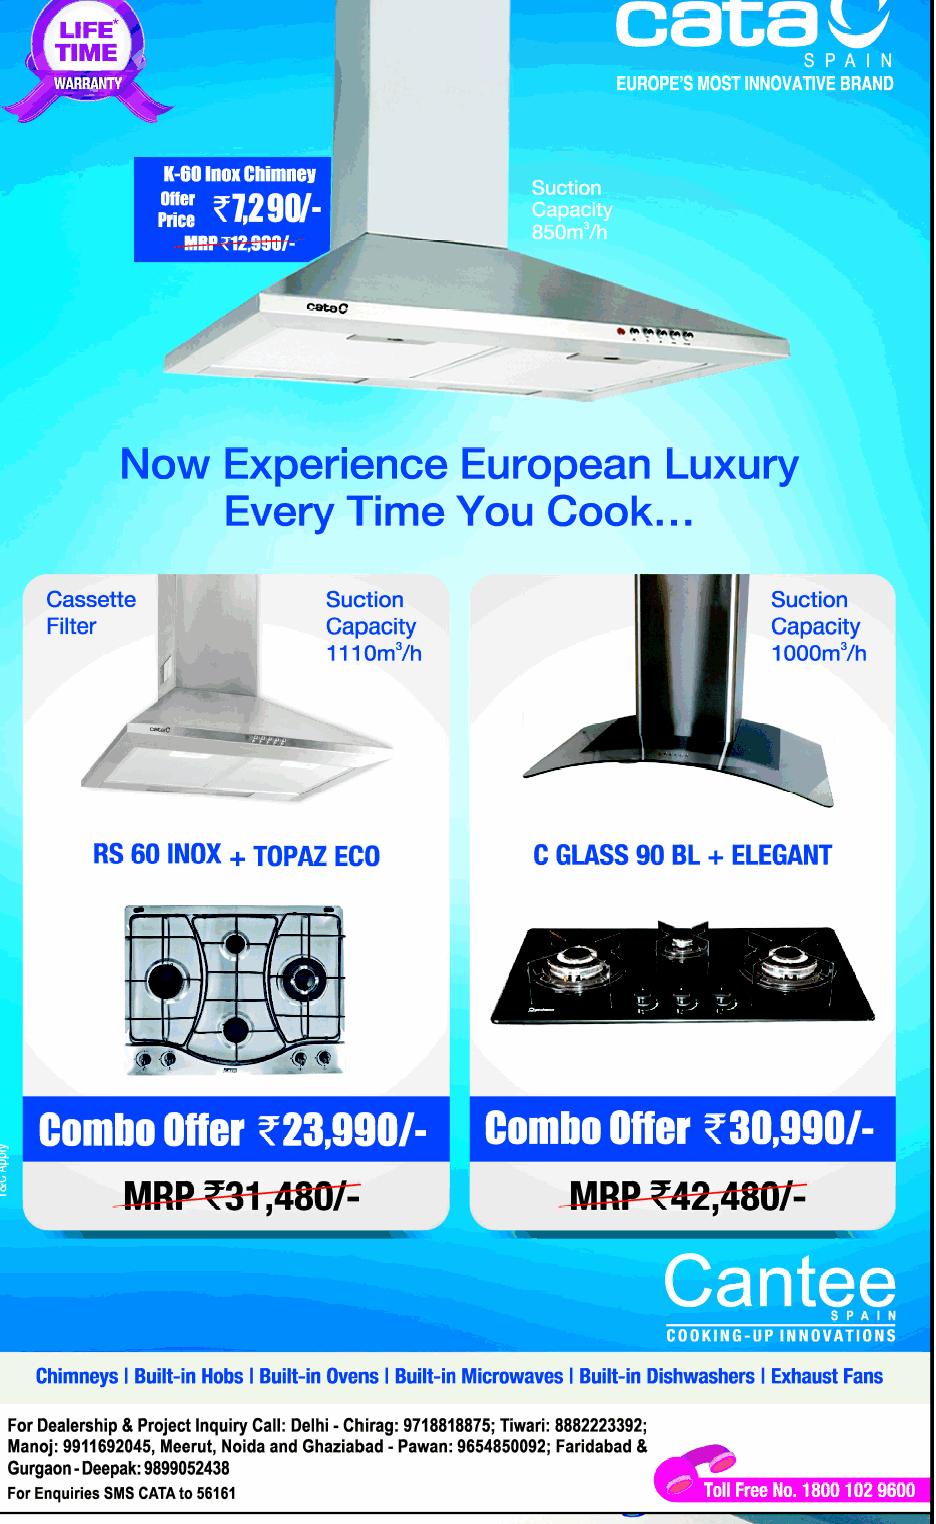 Cata Spain Chimneys - Combo Offers / New Delhi   SaleRaja